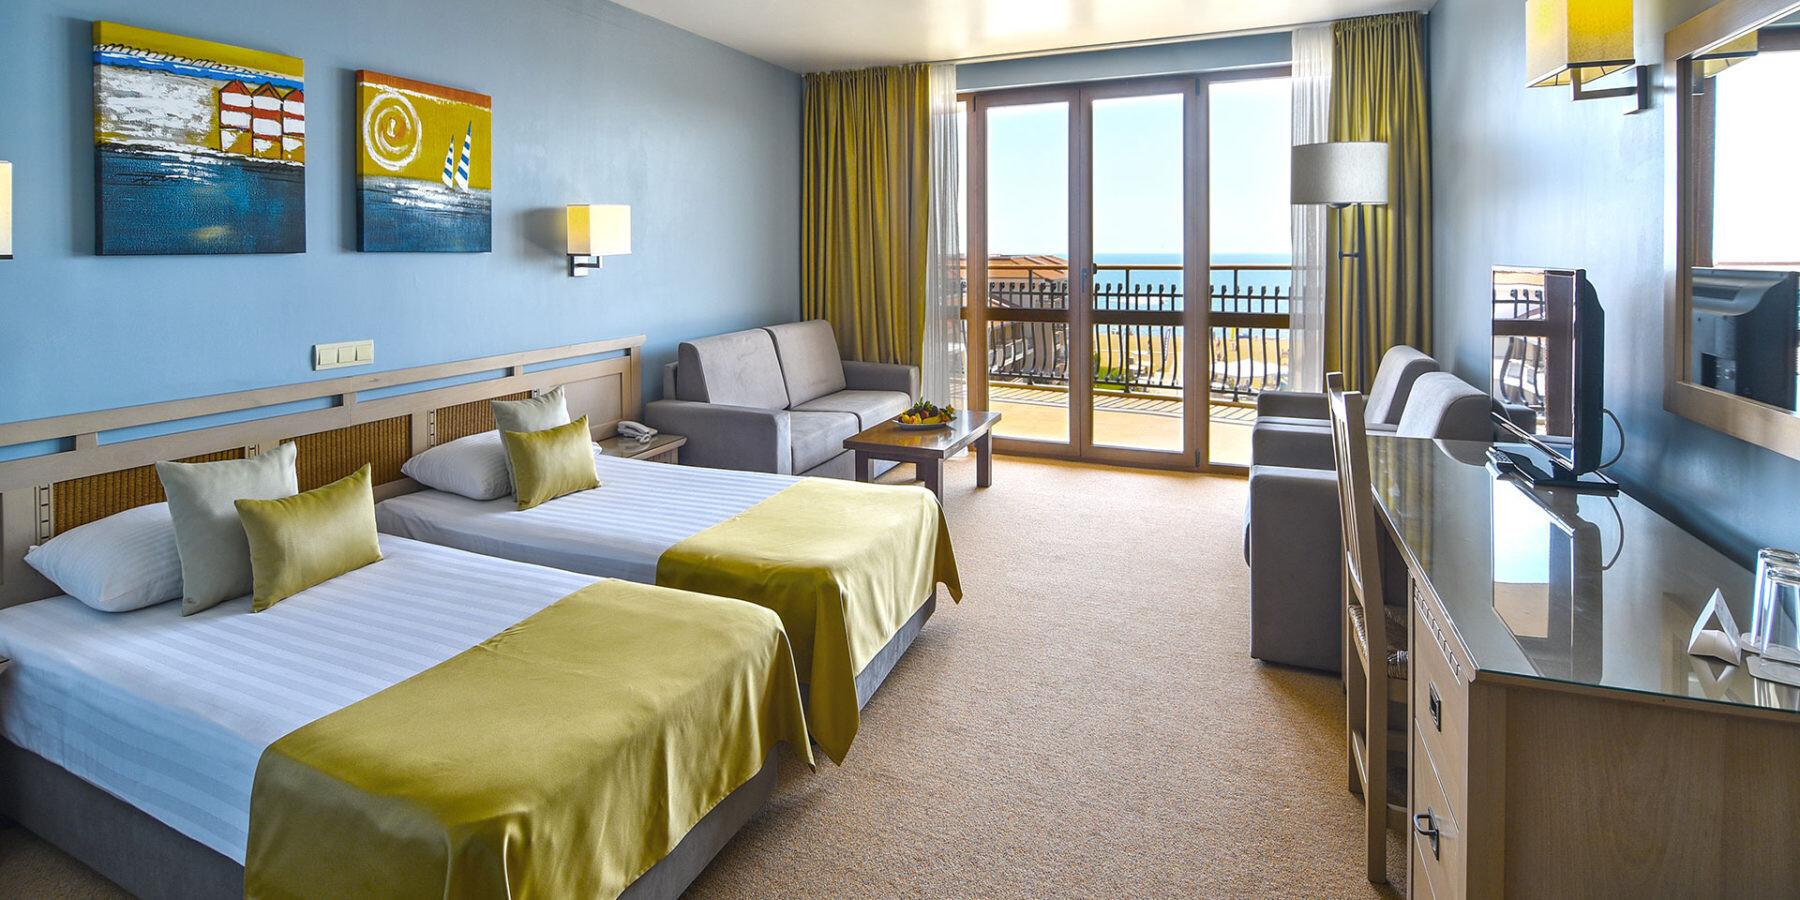 Хотел Мирамар 4* - разширена стая